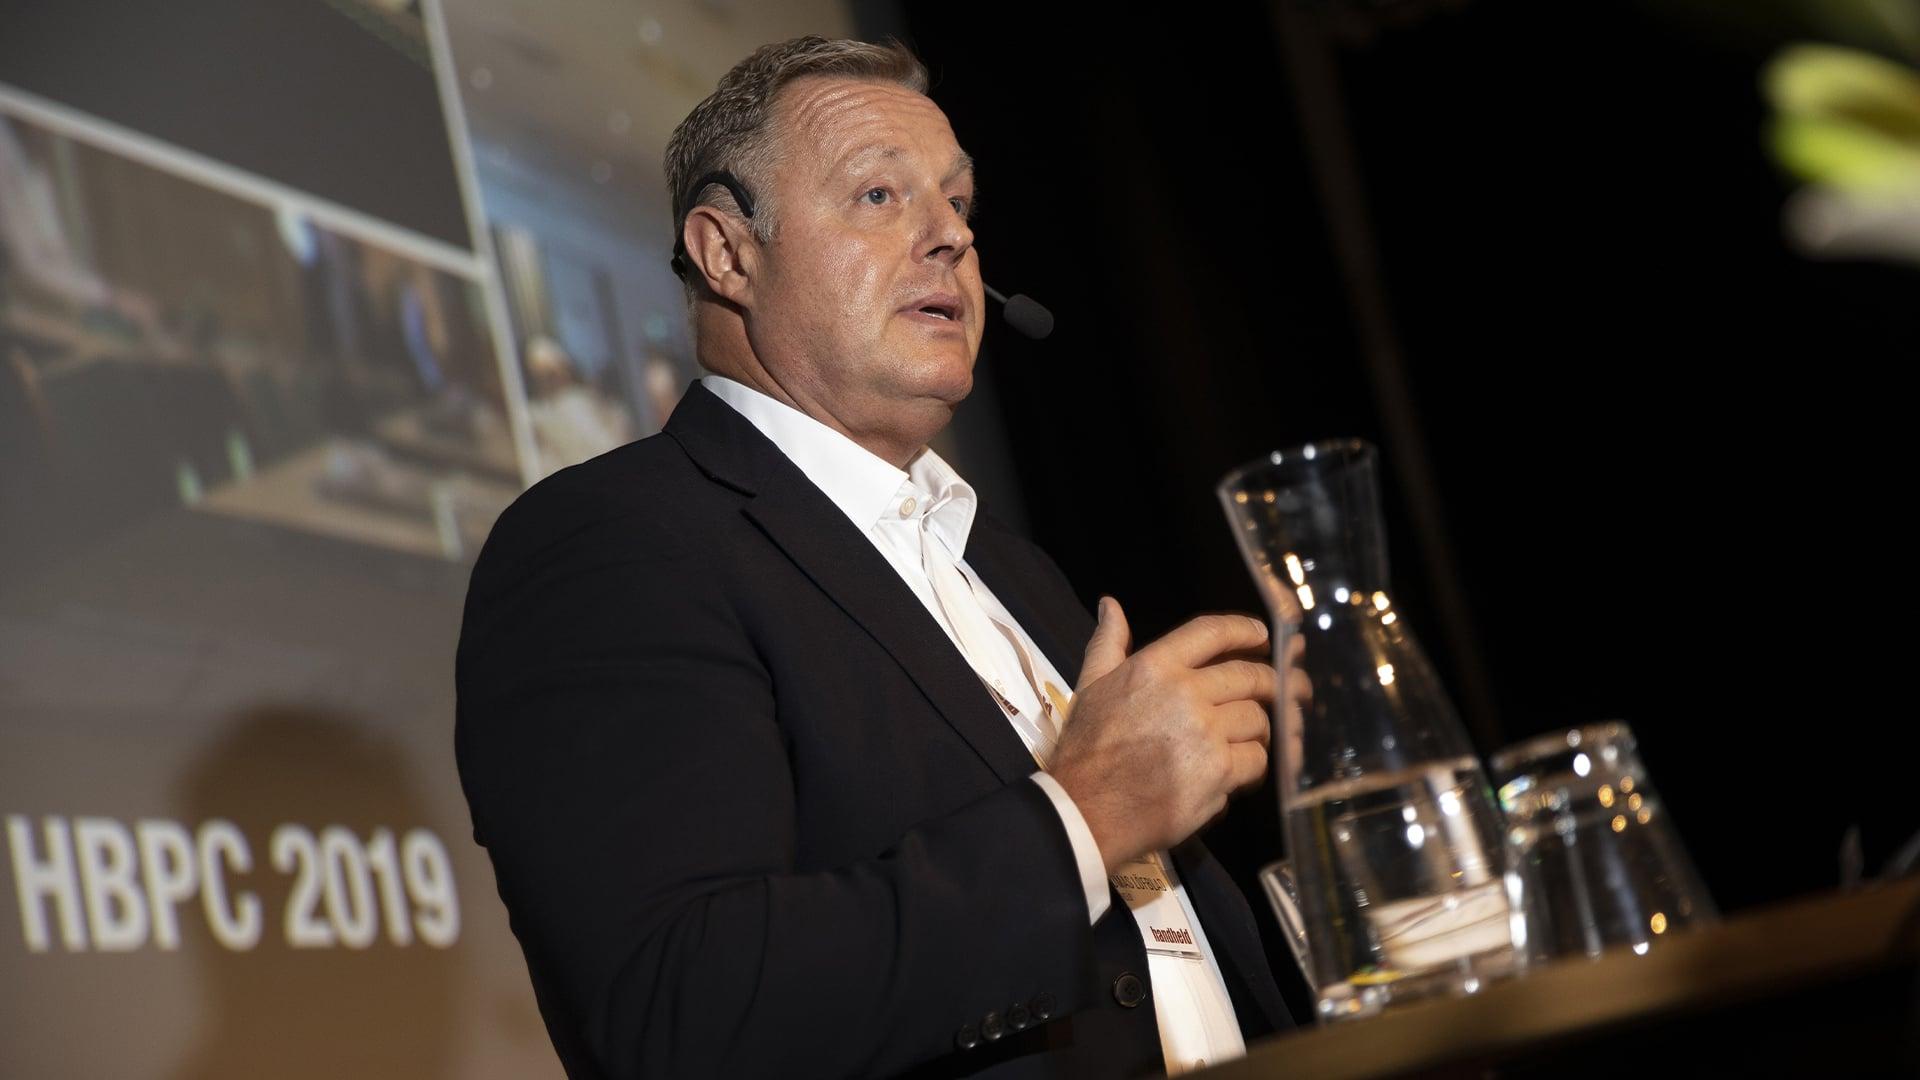 handheld business partner conference thomas löfblad